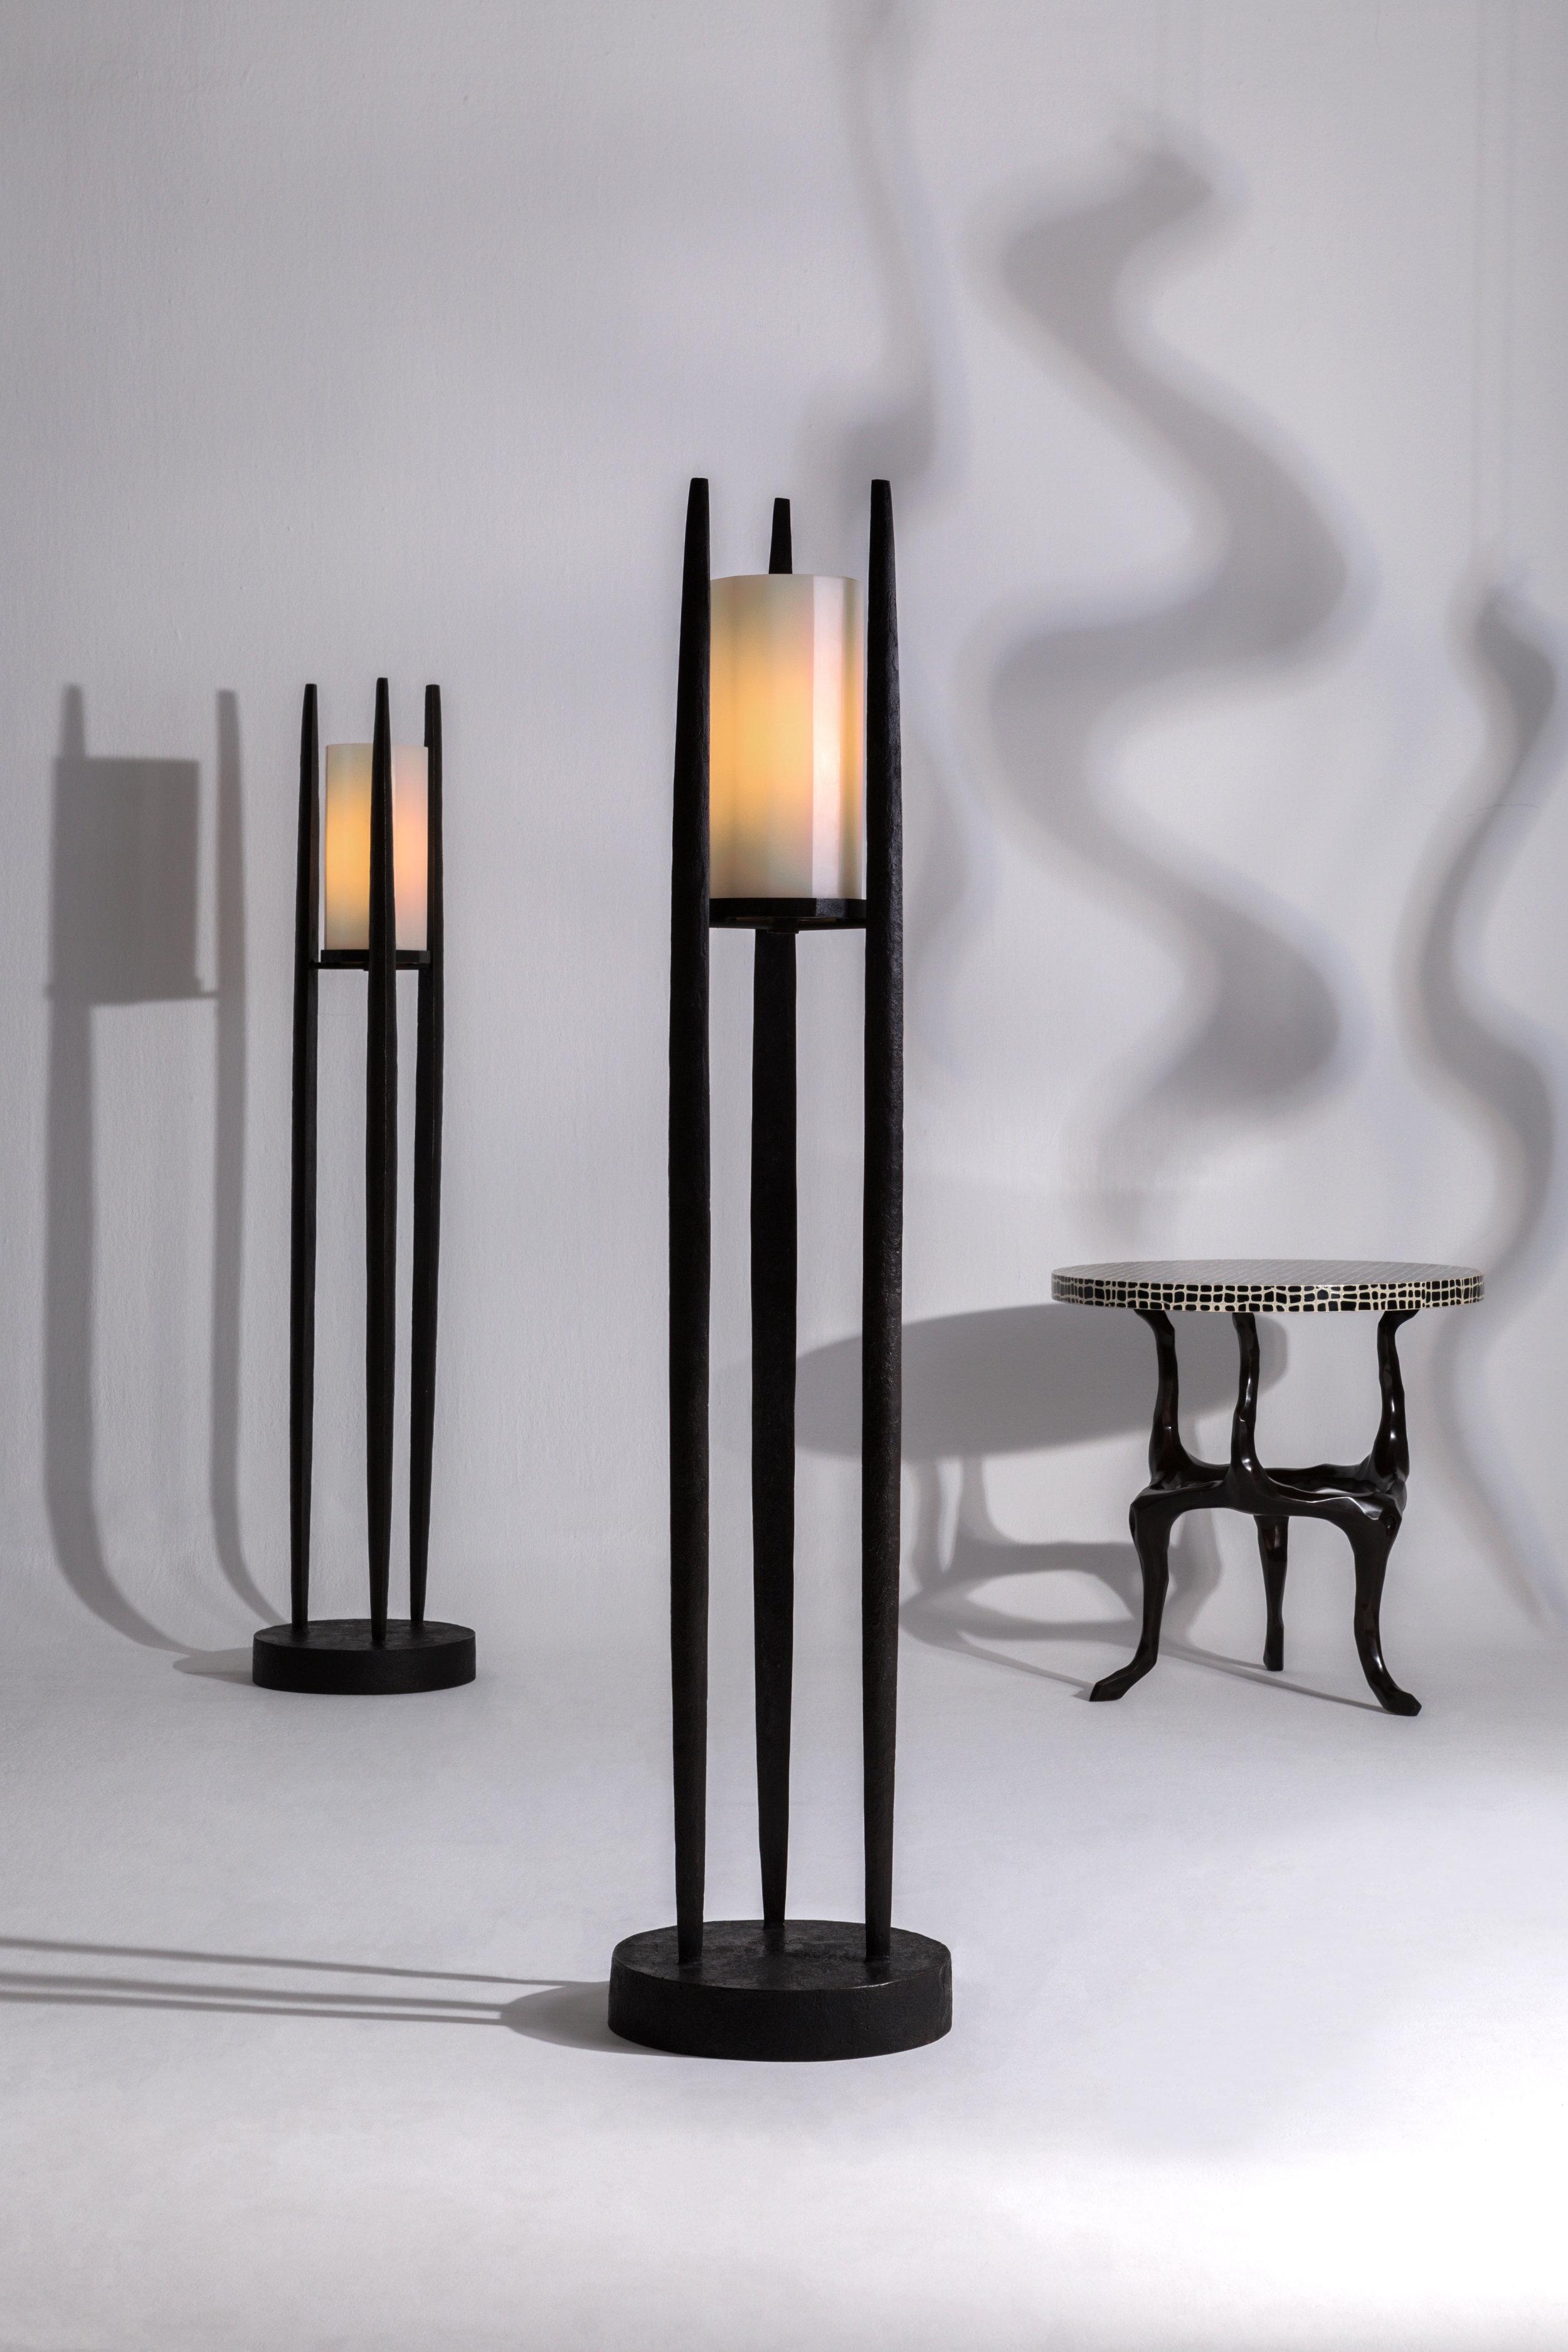 Alexander_Lamont_Lucio_Floor_Lamp_bronze_whitejade_Peking_Glass_MSS_0997.jpg